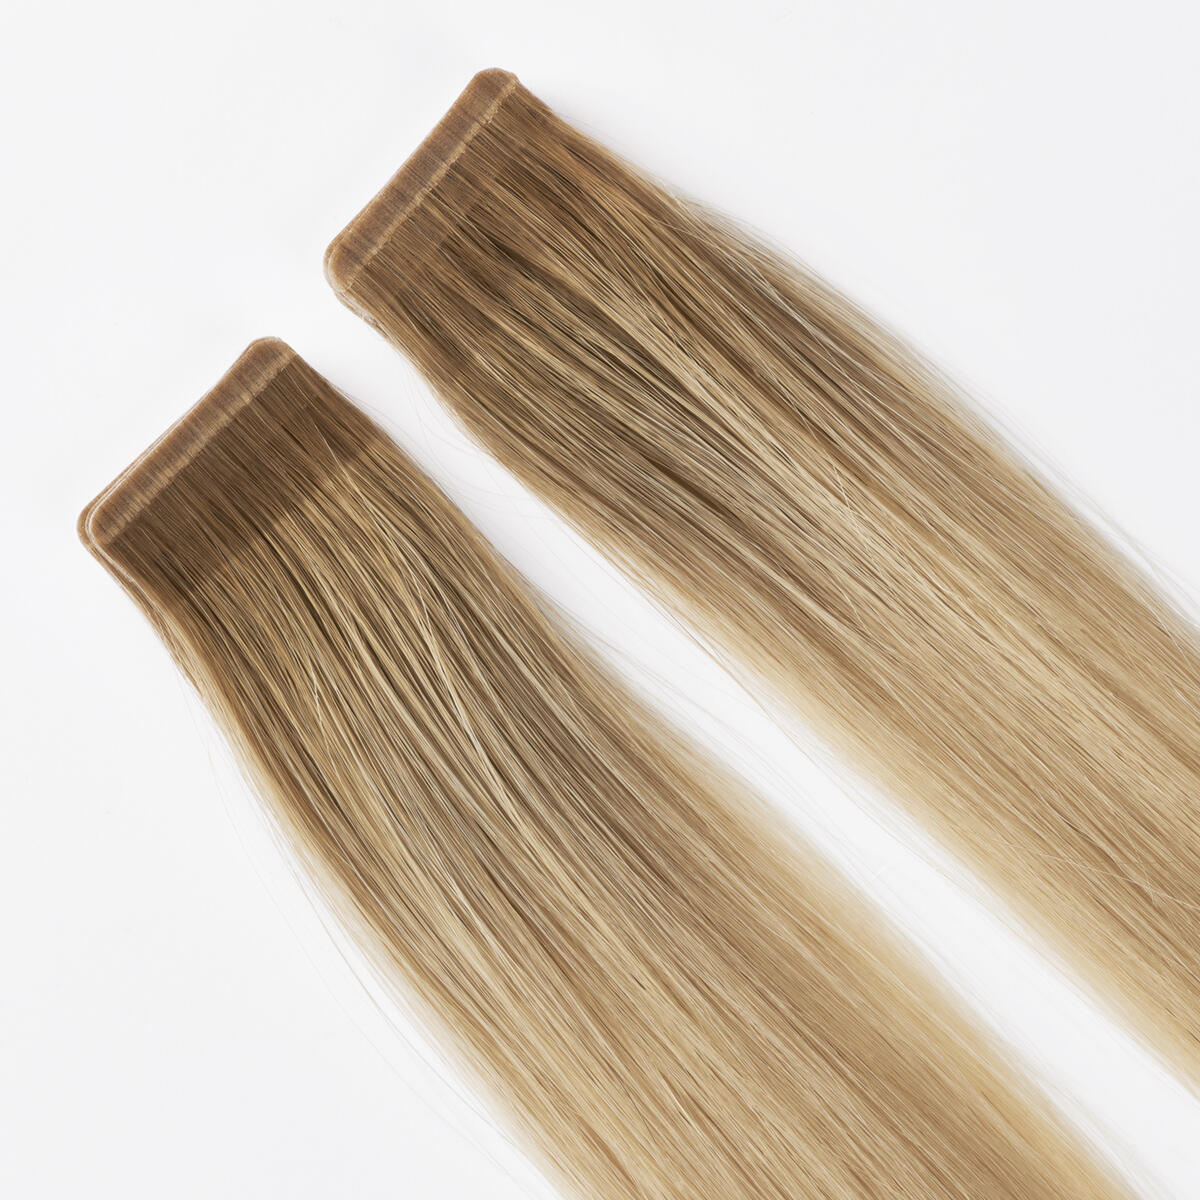 Sleek Tape Extension Premium C7.3/8.3 Brilliant Blonde ColorMelt 50 cm